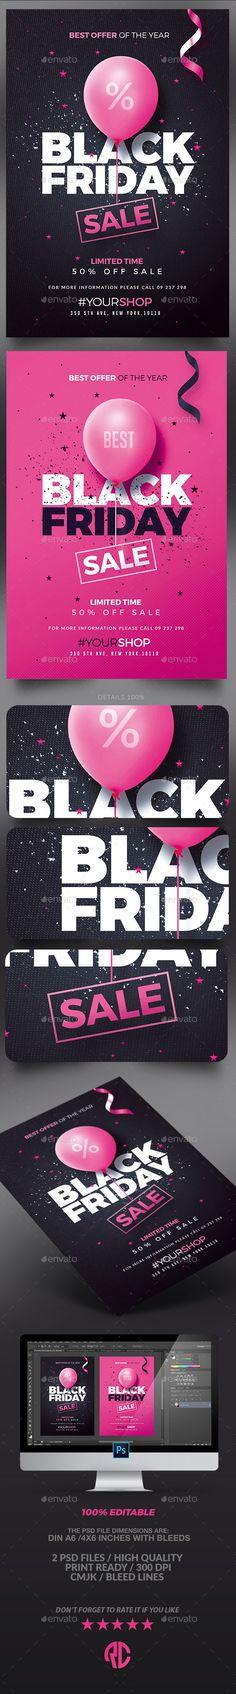 Black Friday | Flyer Template PSD: